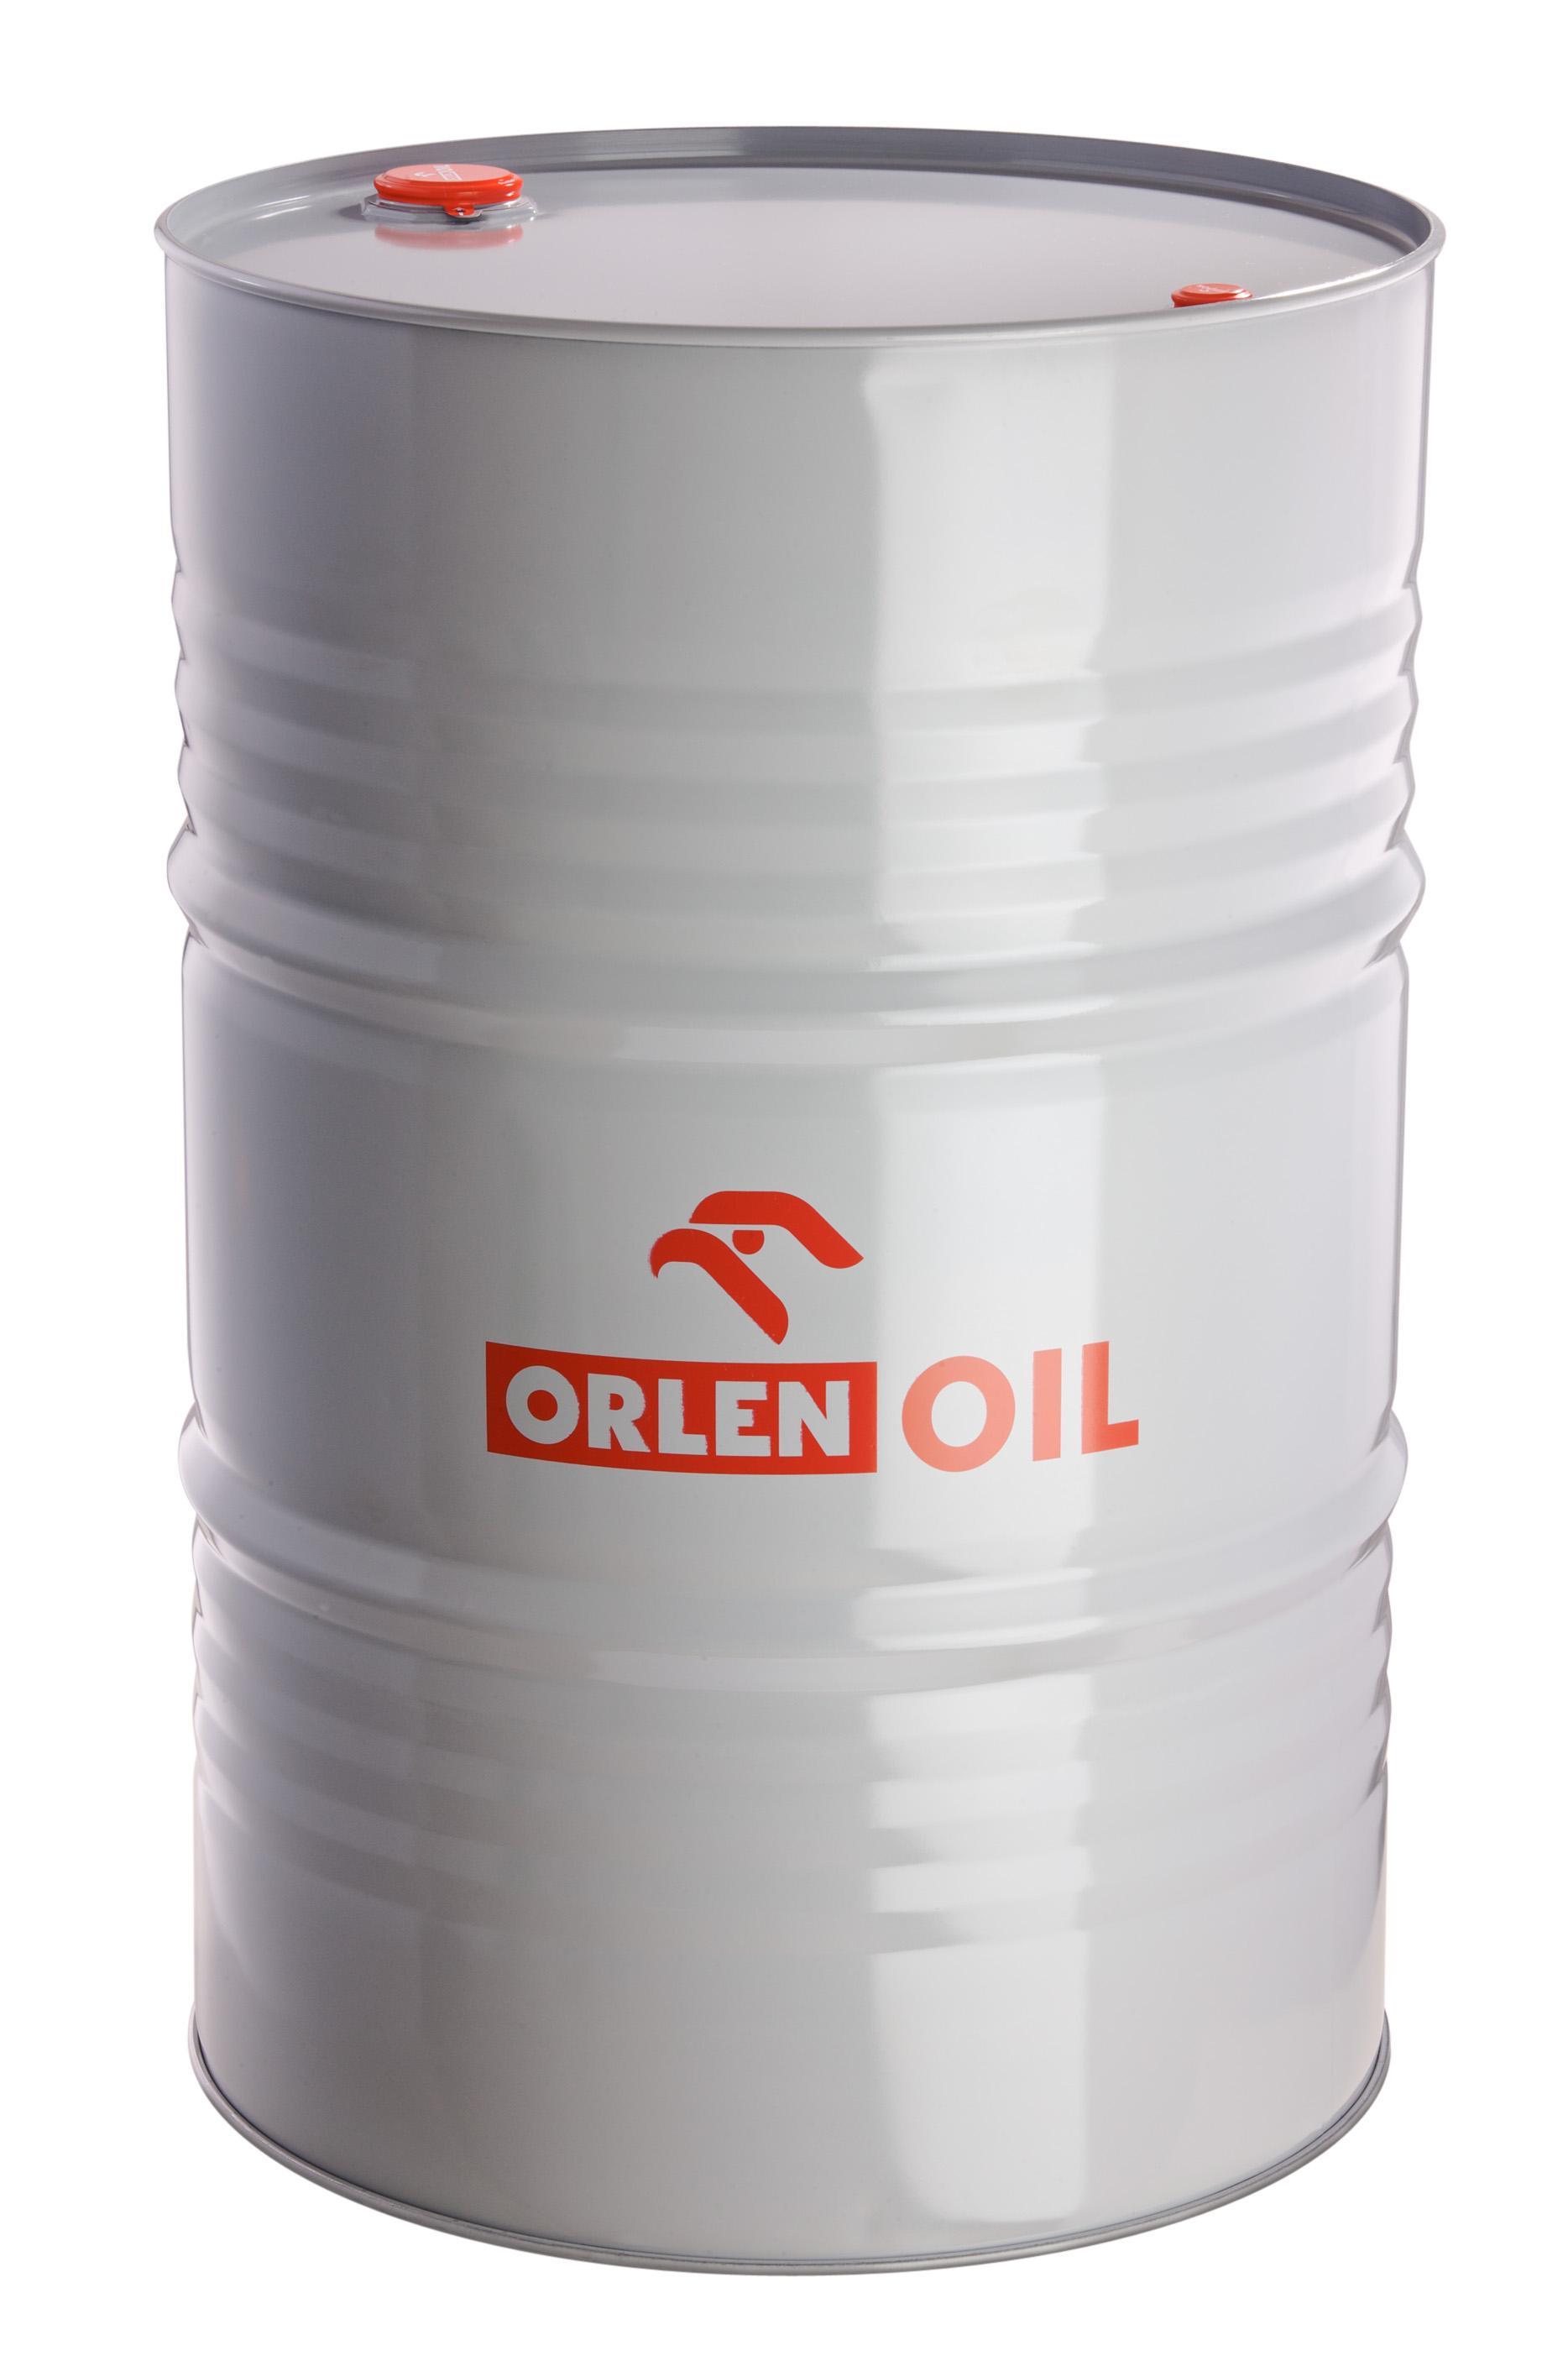 ORLEN OIL OLEJ DO OSI  U   BECZKA 205L